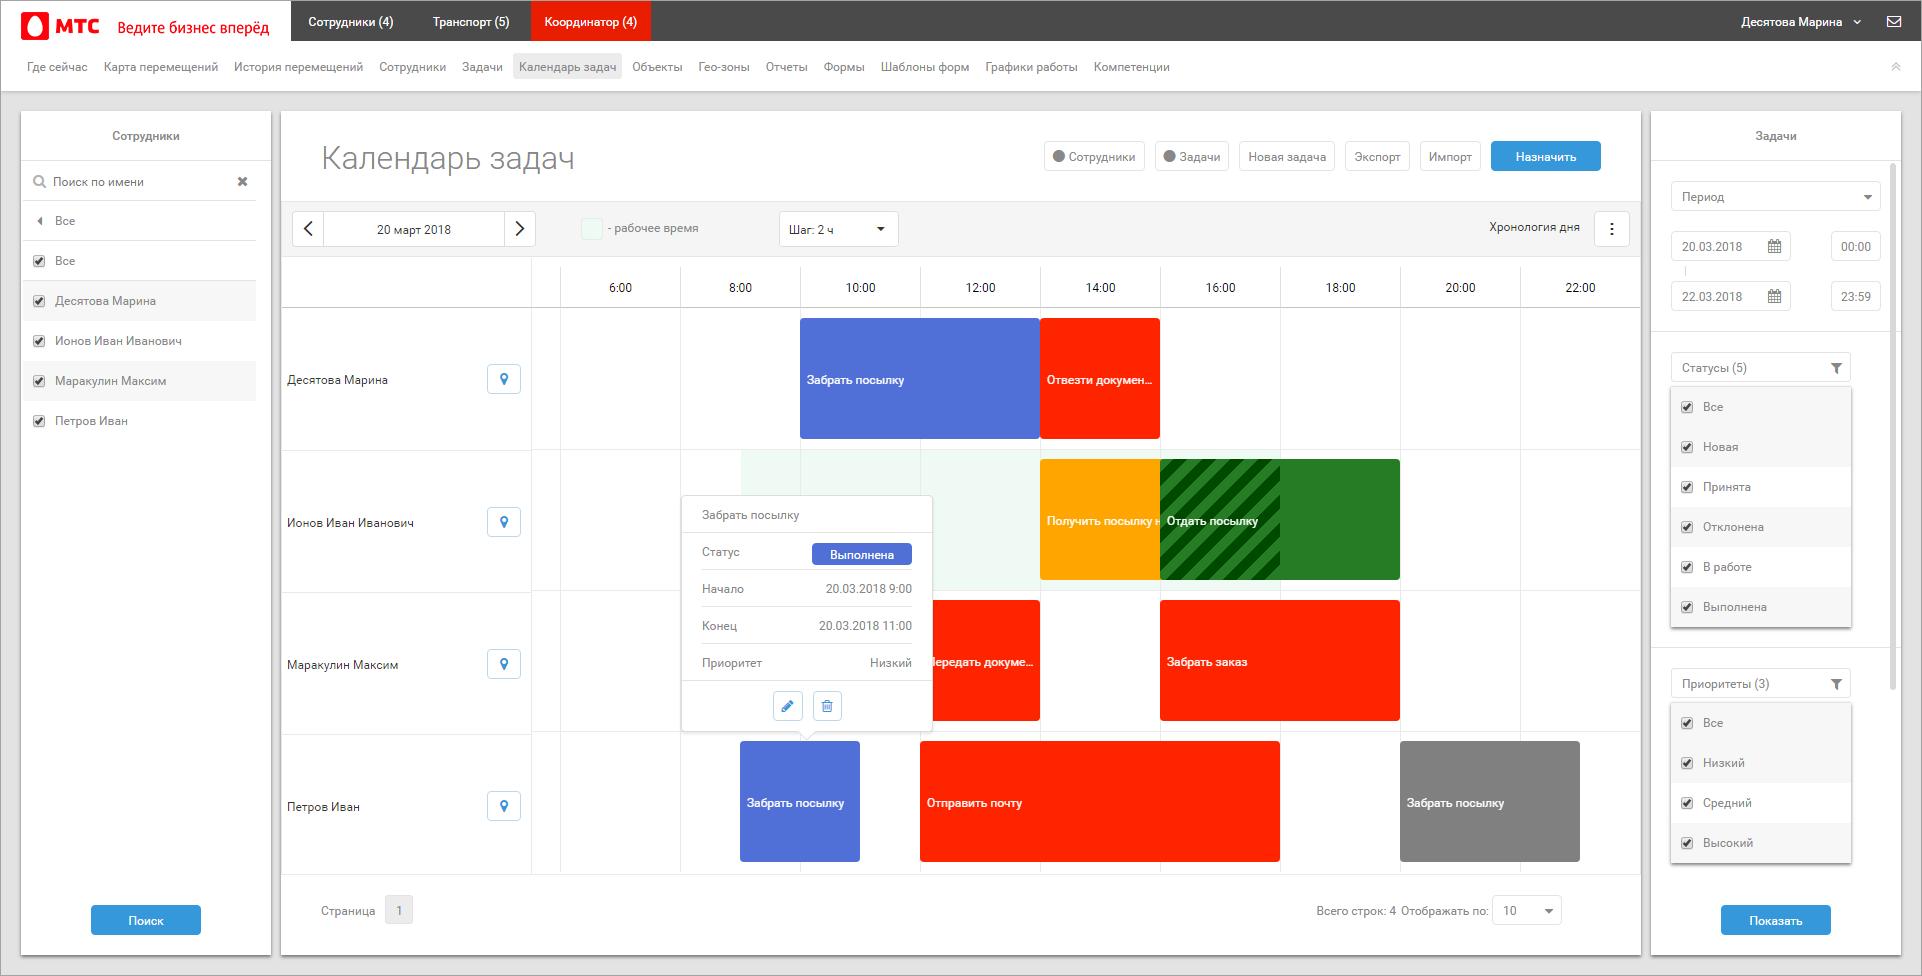 Календарь задач в интерфейсе